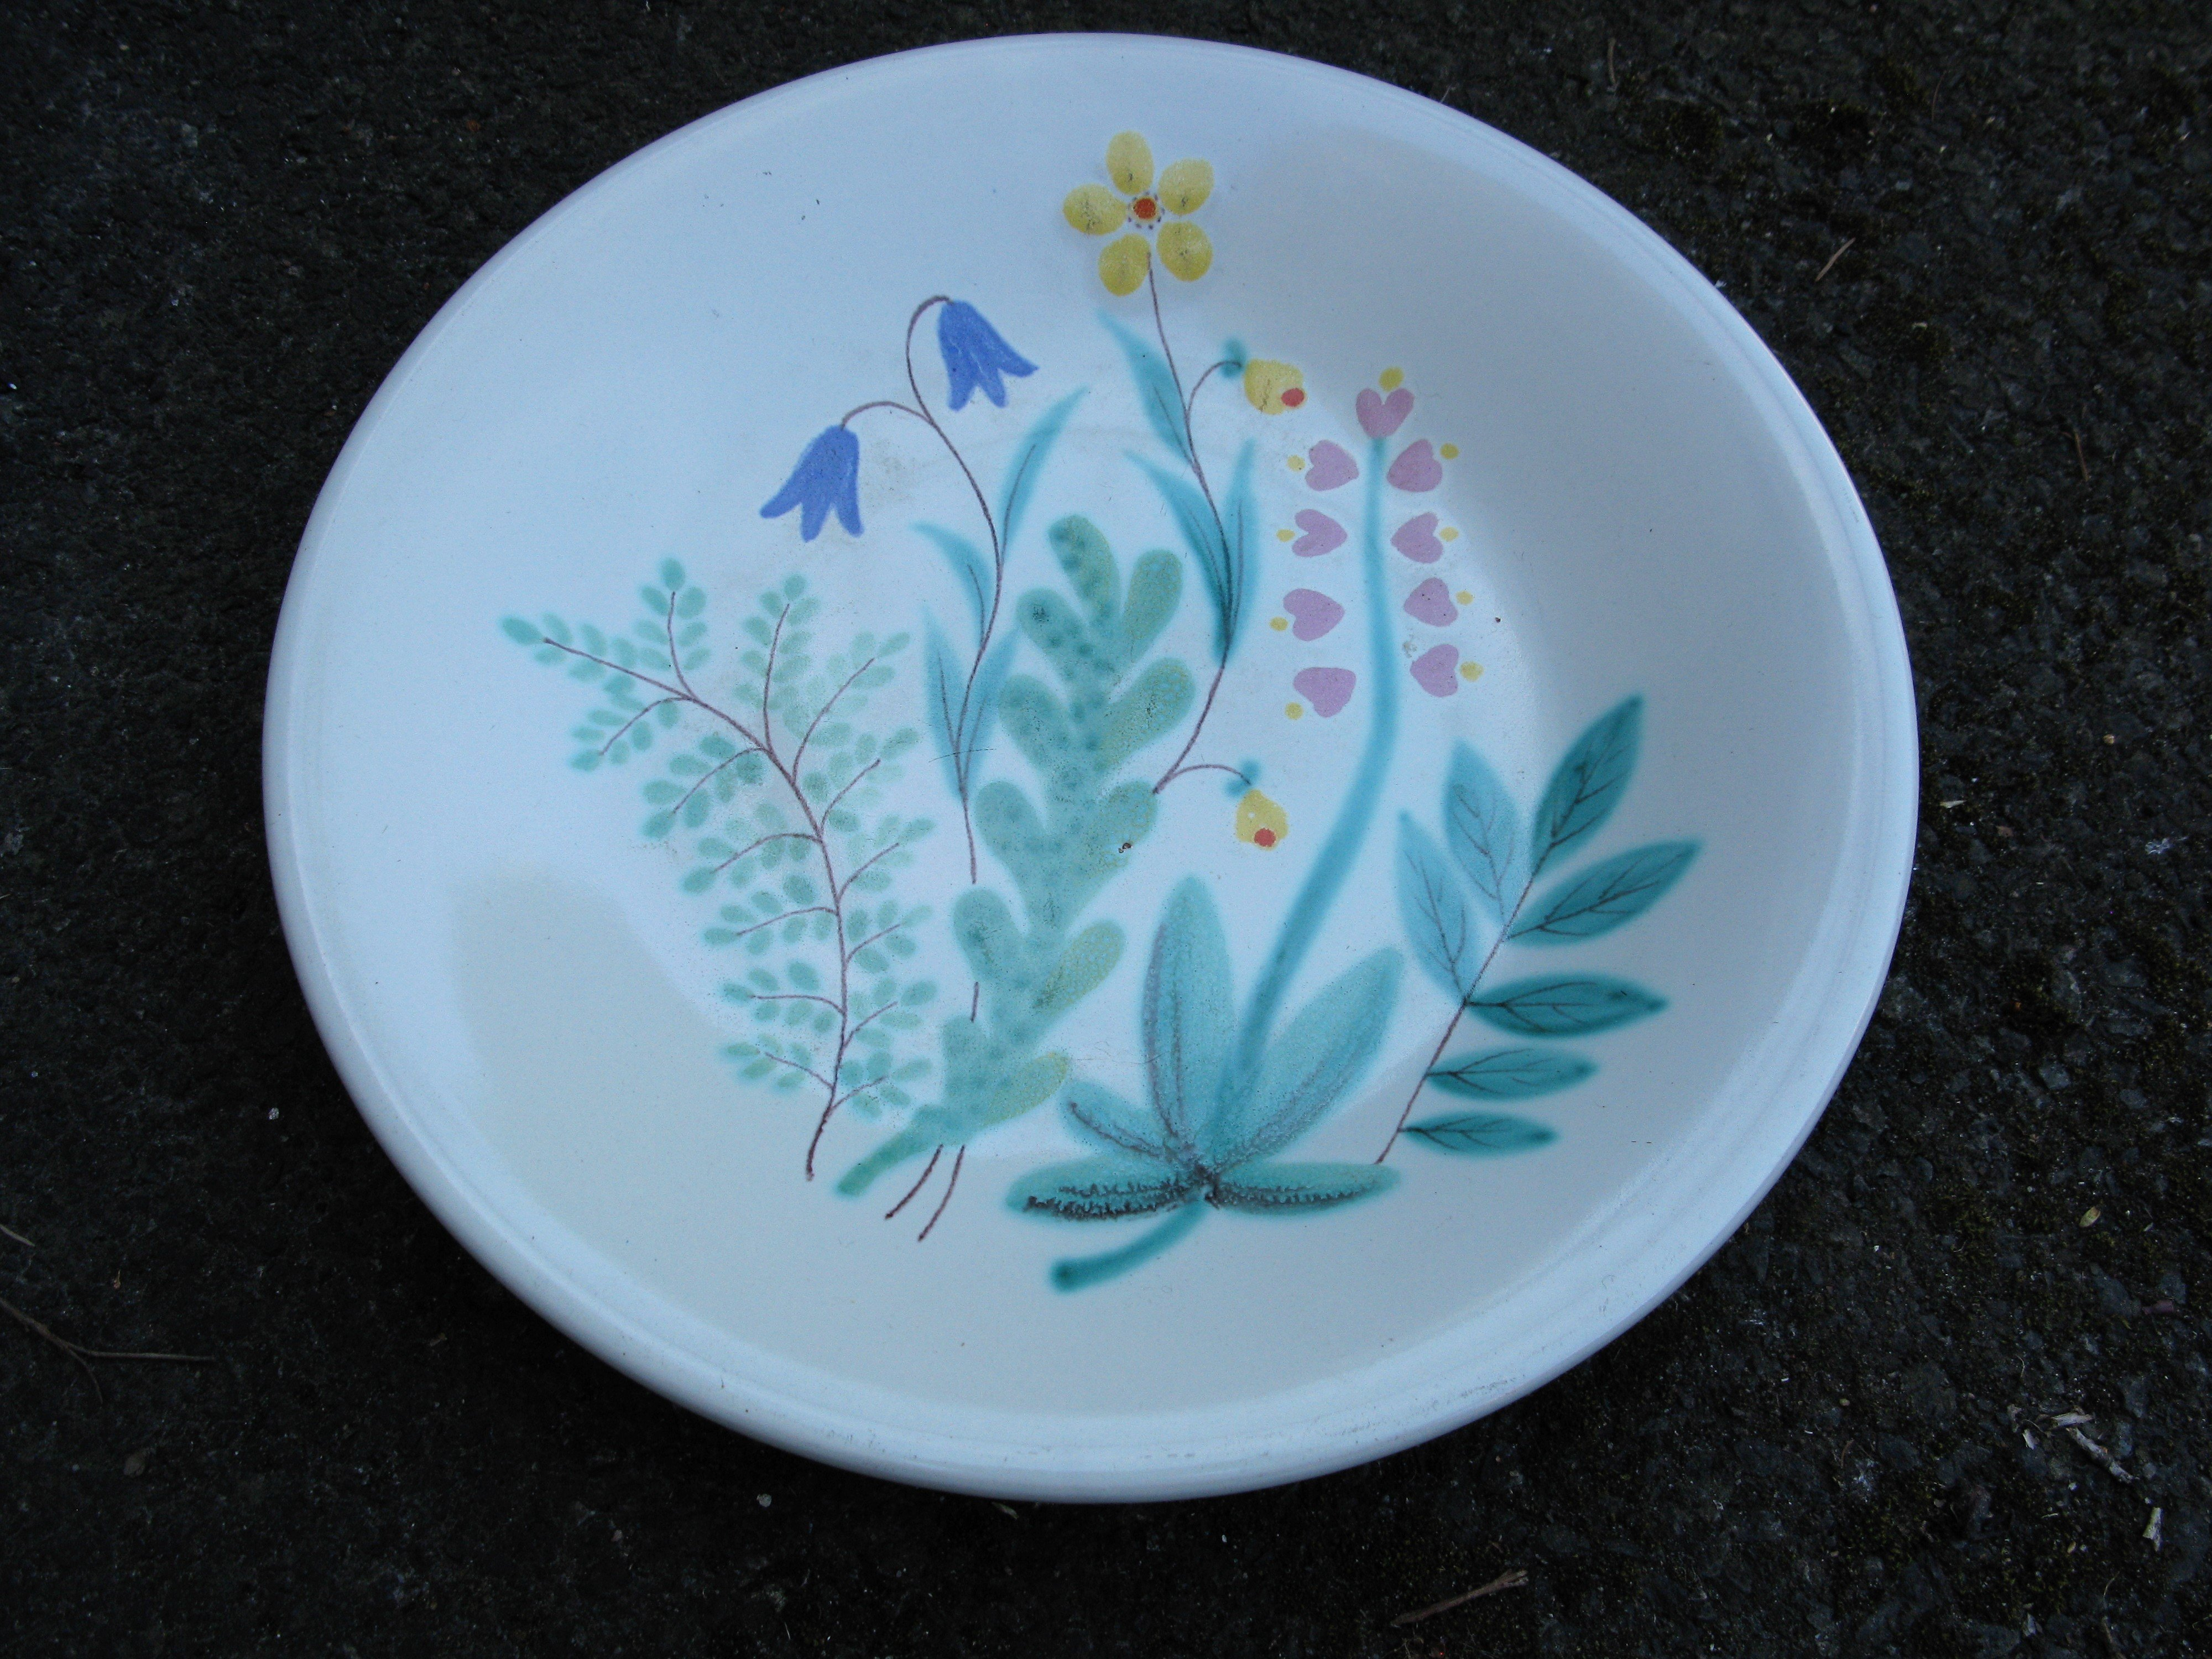 ängsblom plate 2